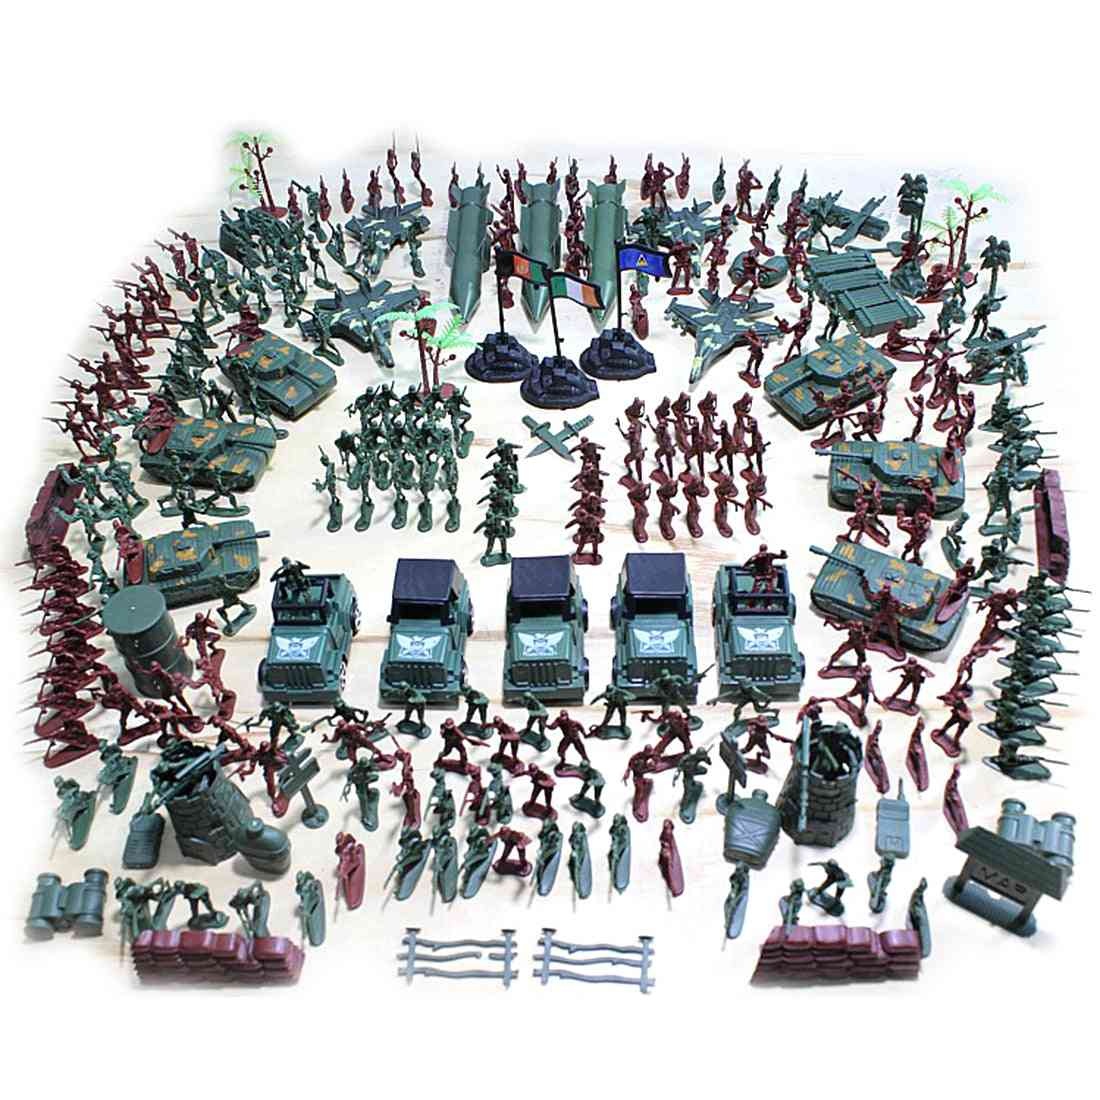 301pcs 5cm Plastic Soldier Model World War Ii Soldier Military Toy Set